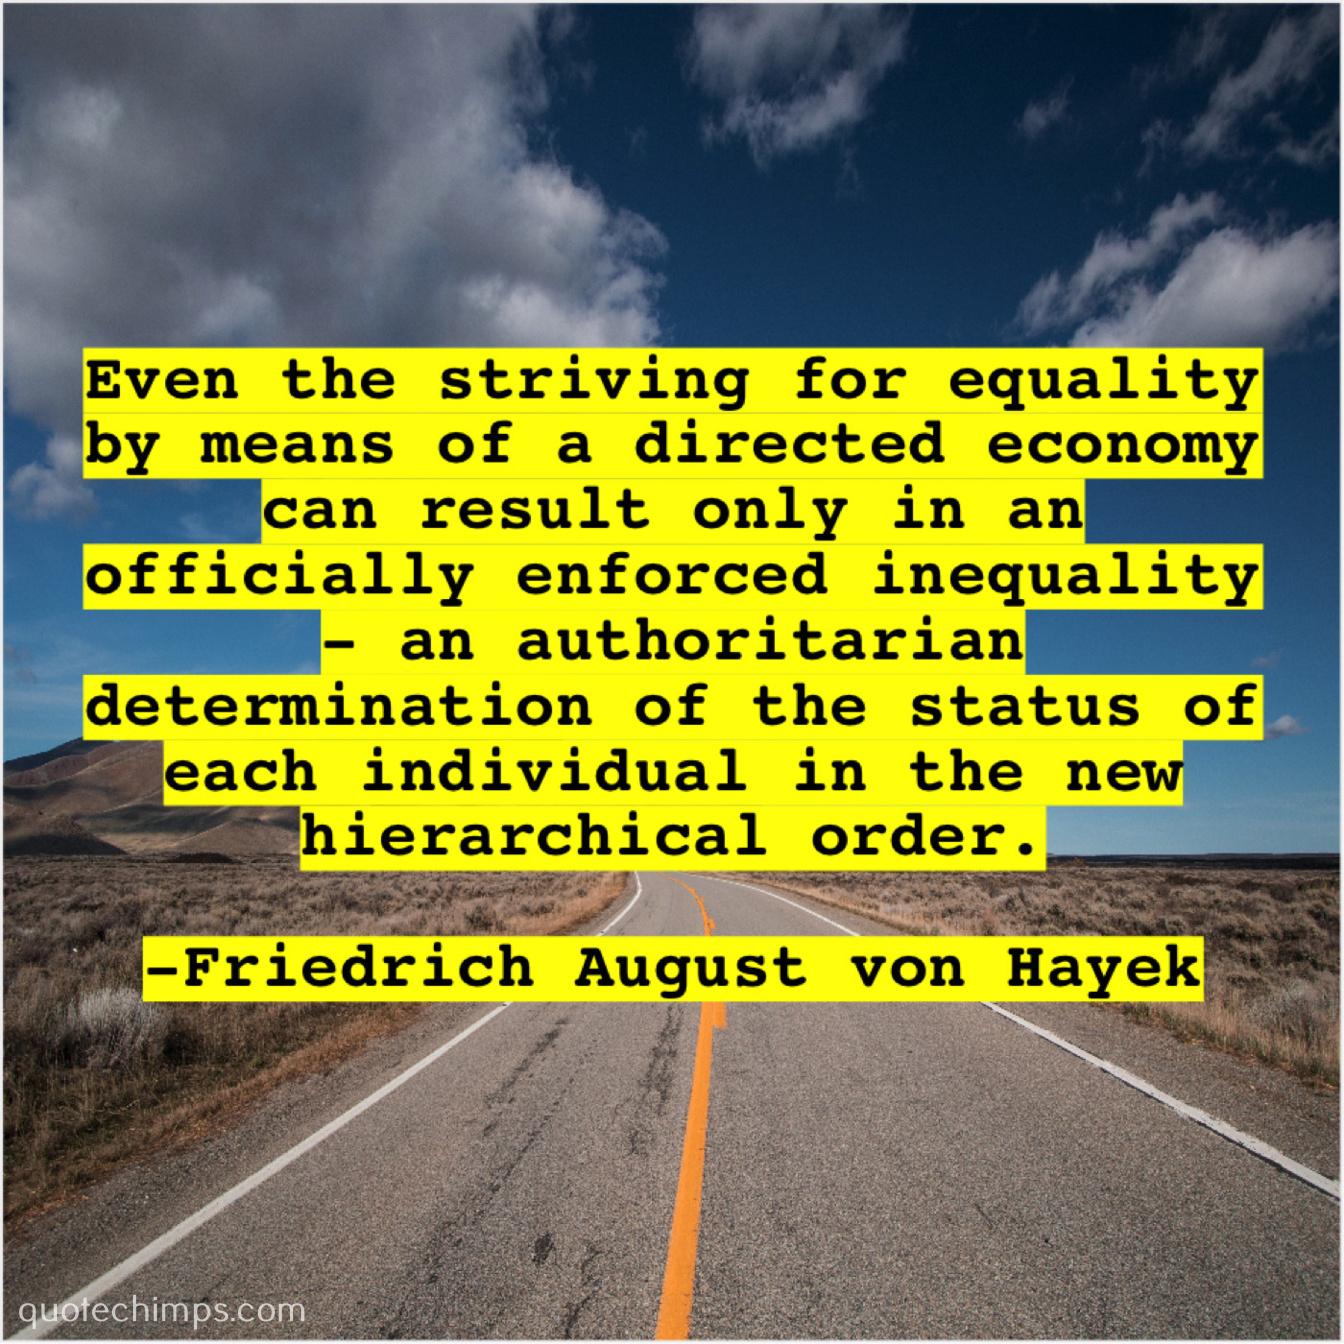 Friedrich August von Hayek – Even the striving for equality… |